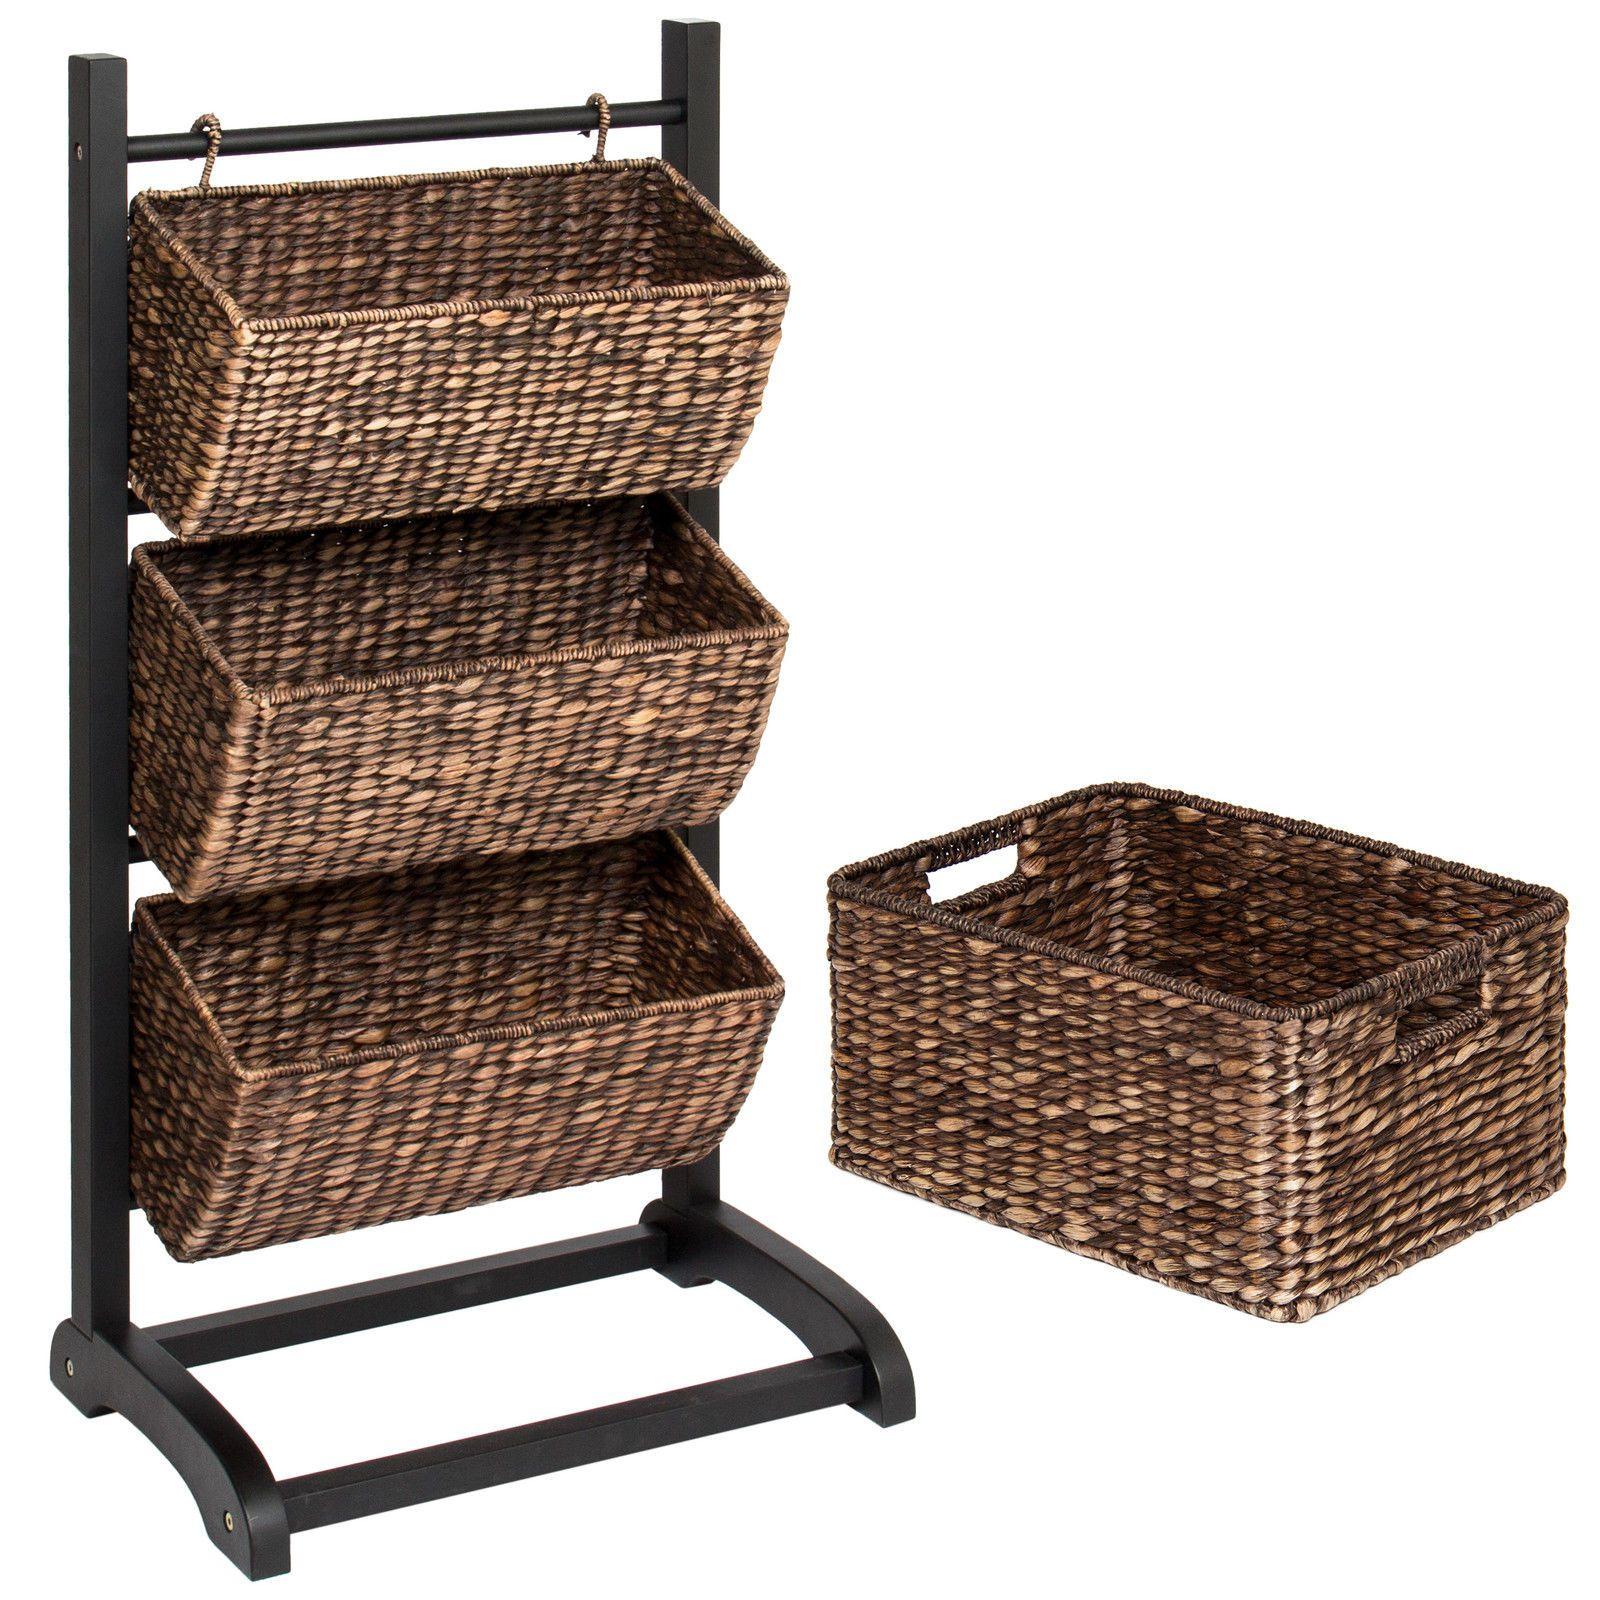 2018 Water Hyacinth 3 Tier Storage Cubby Metal Shelf W/ Bonus Basket  Brushed Espresso From Newlife2016dh, $90.46   Dhgate.Com